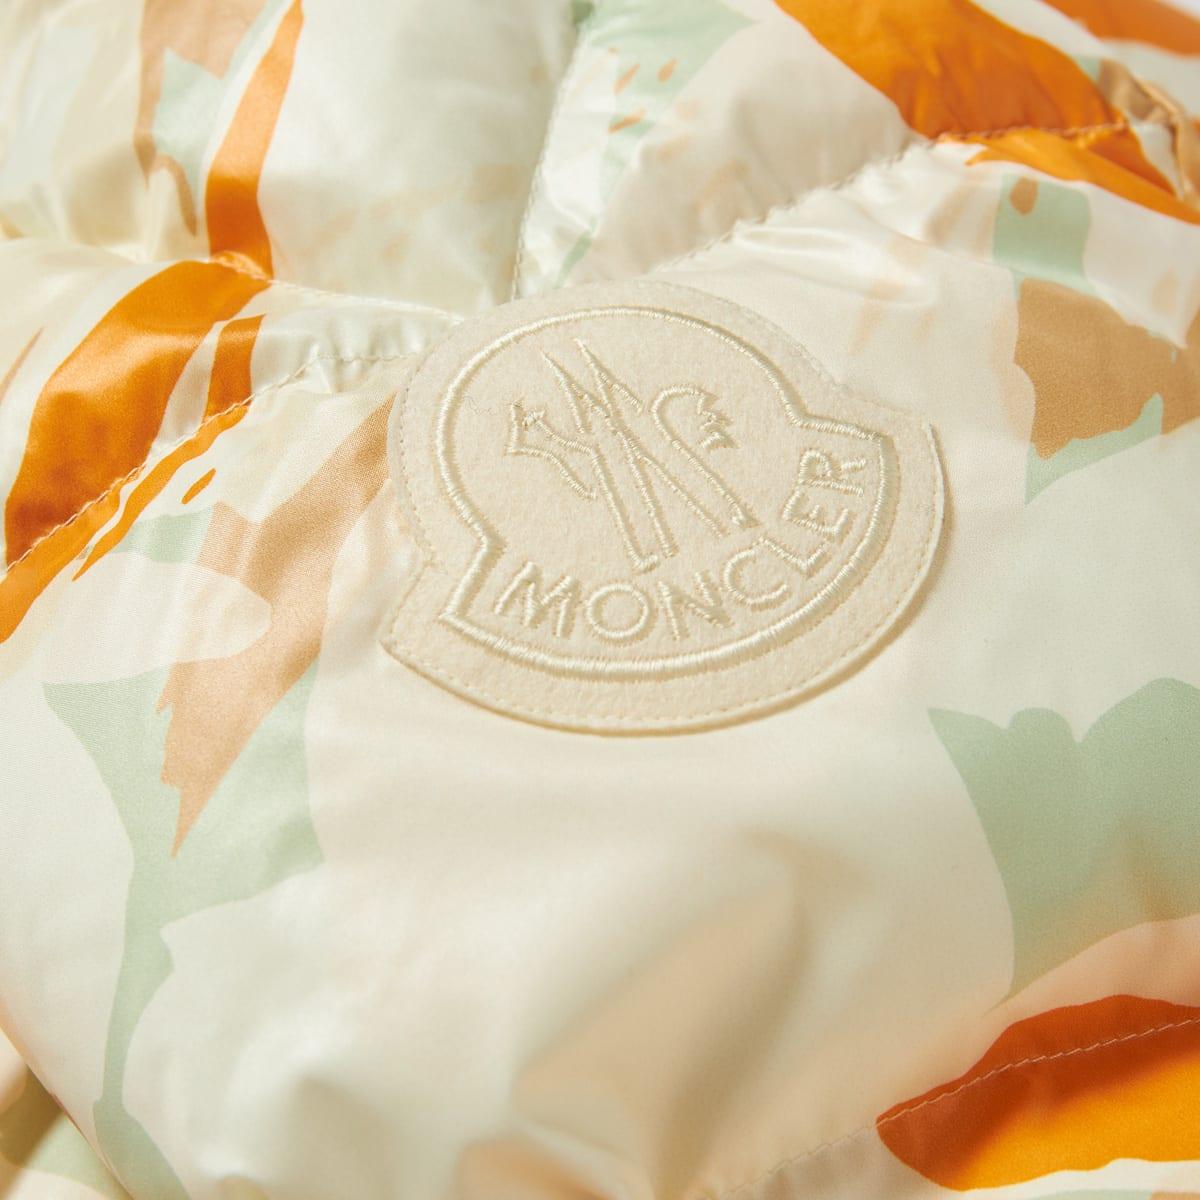 Moncler Genius 2 Moncler 1952 Camo Jacket - END. Exclusive 1A540-53A74-310